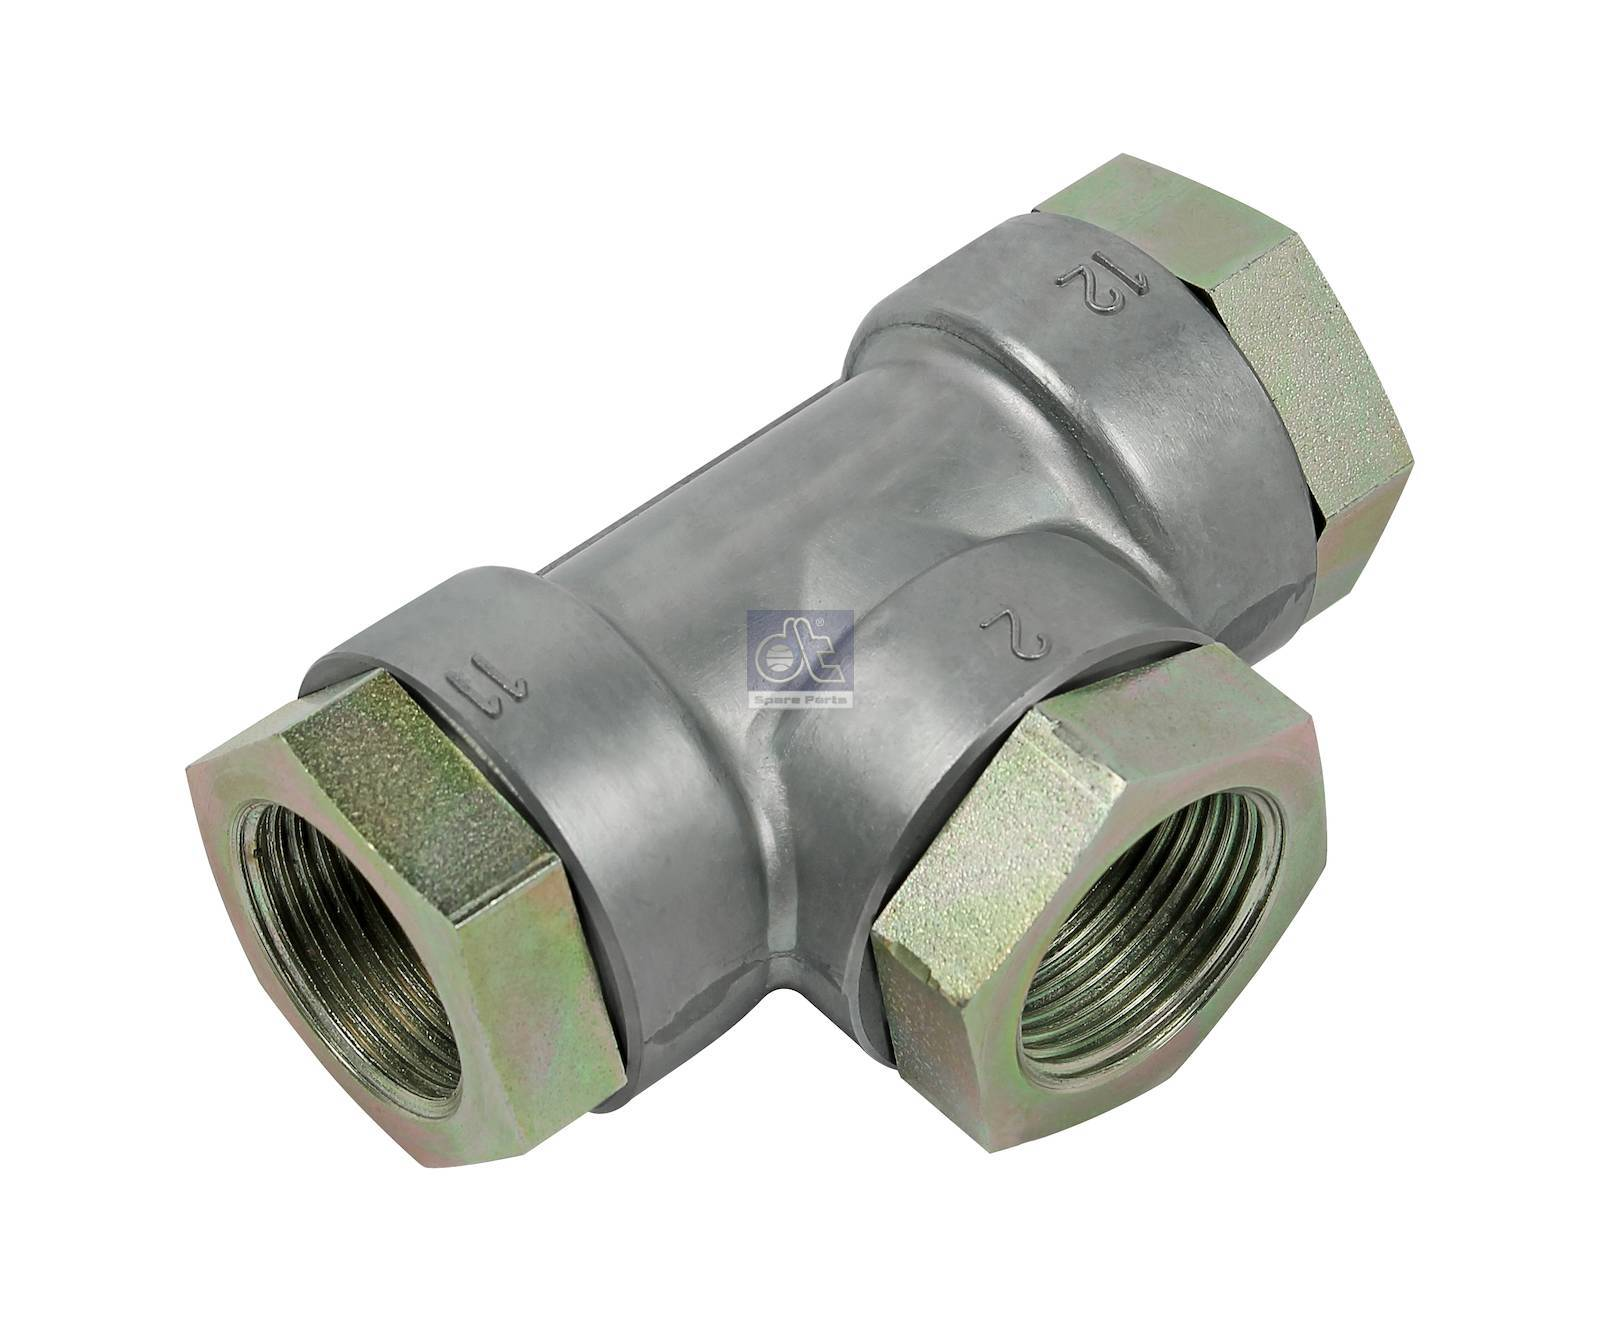 2-way valve